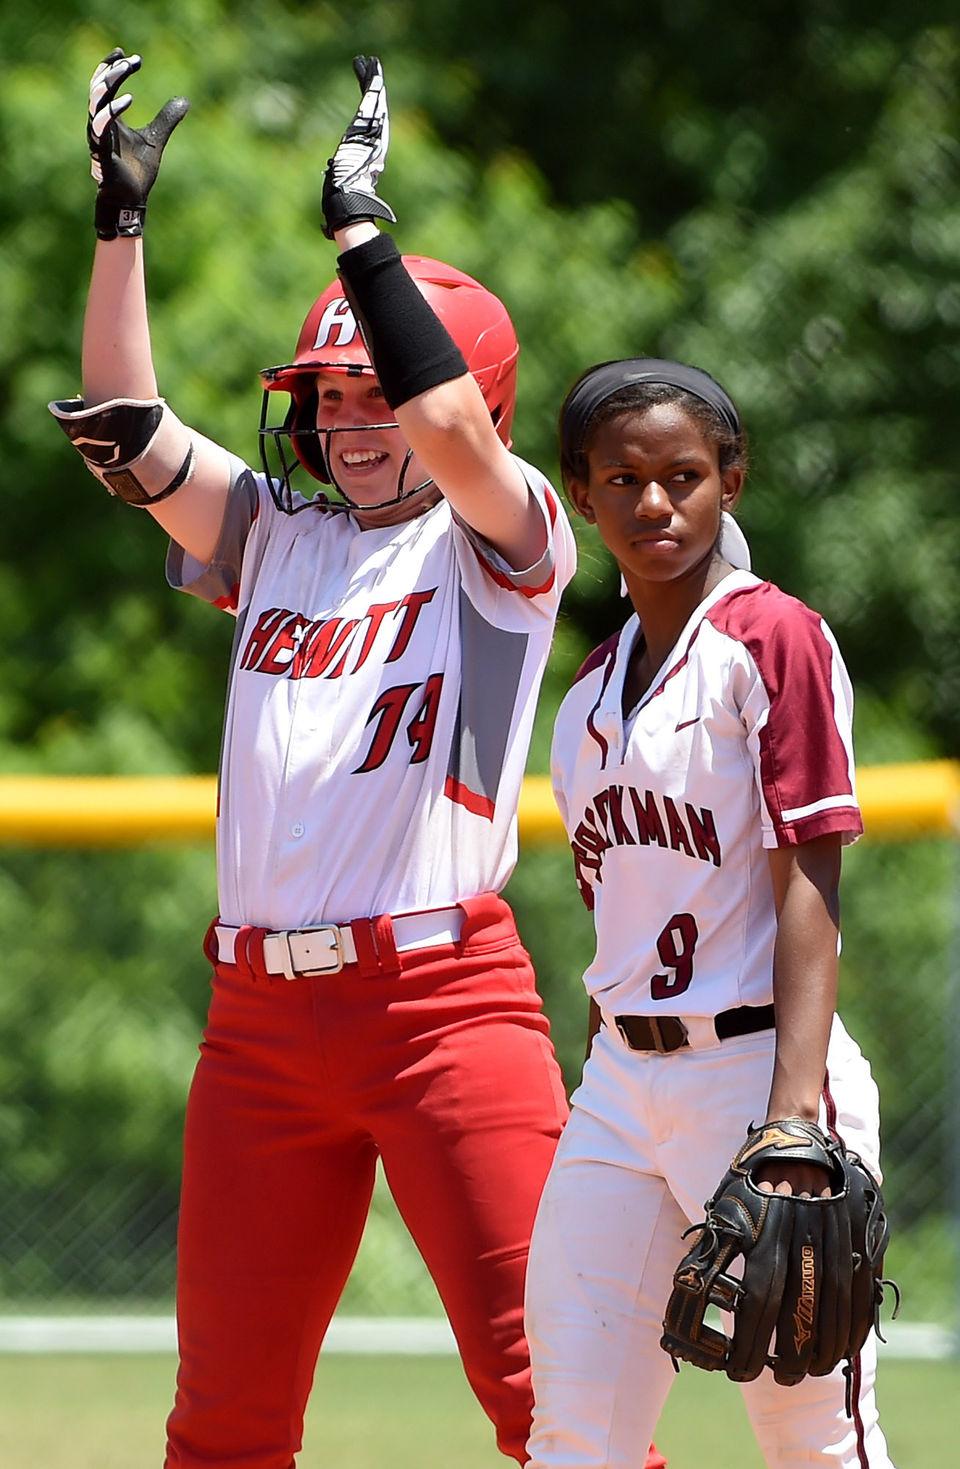 Rewind Saturday's Alabama HS baseball and softball championships in